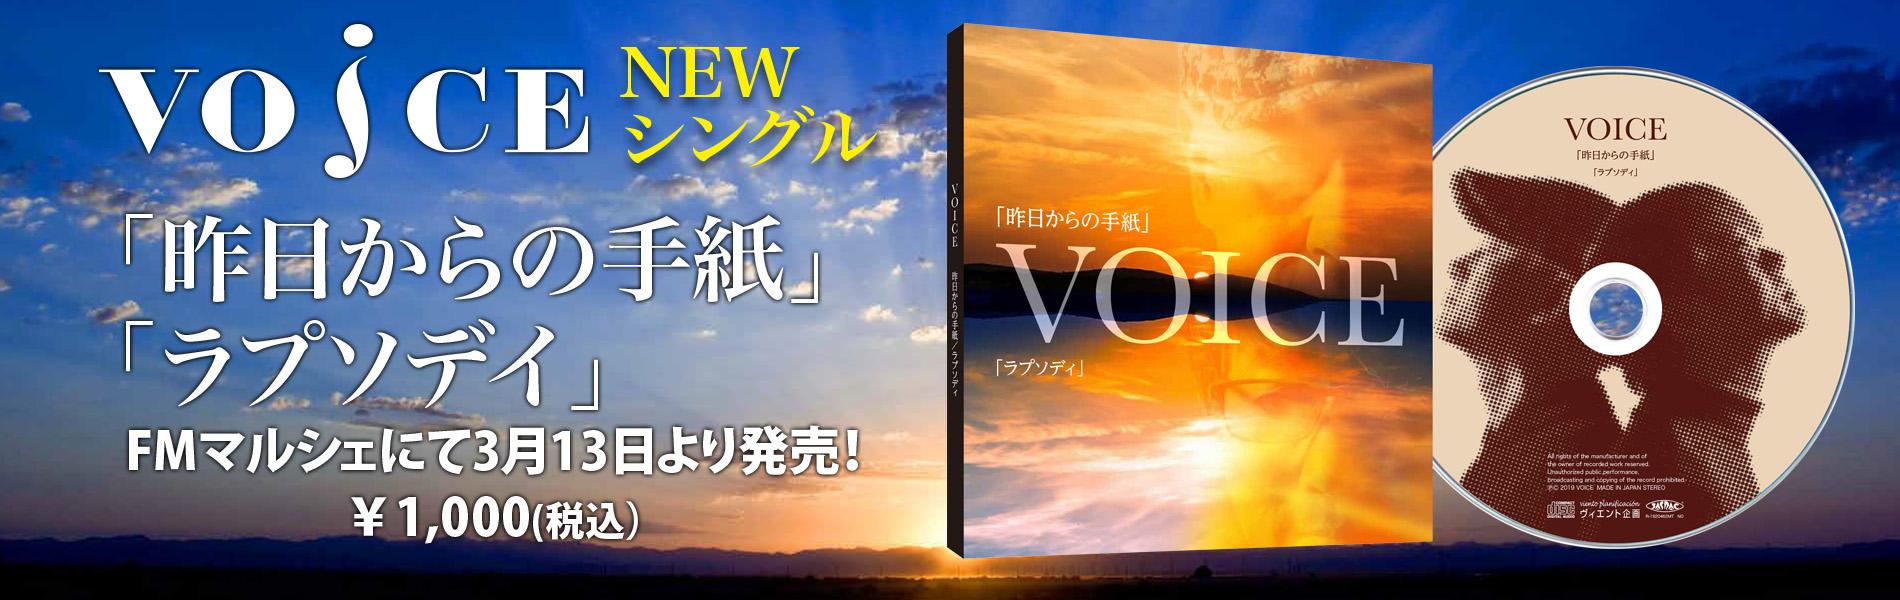 NEW シングル発売